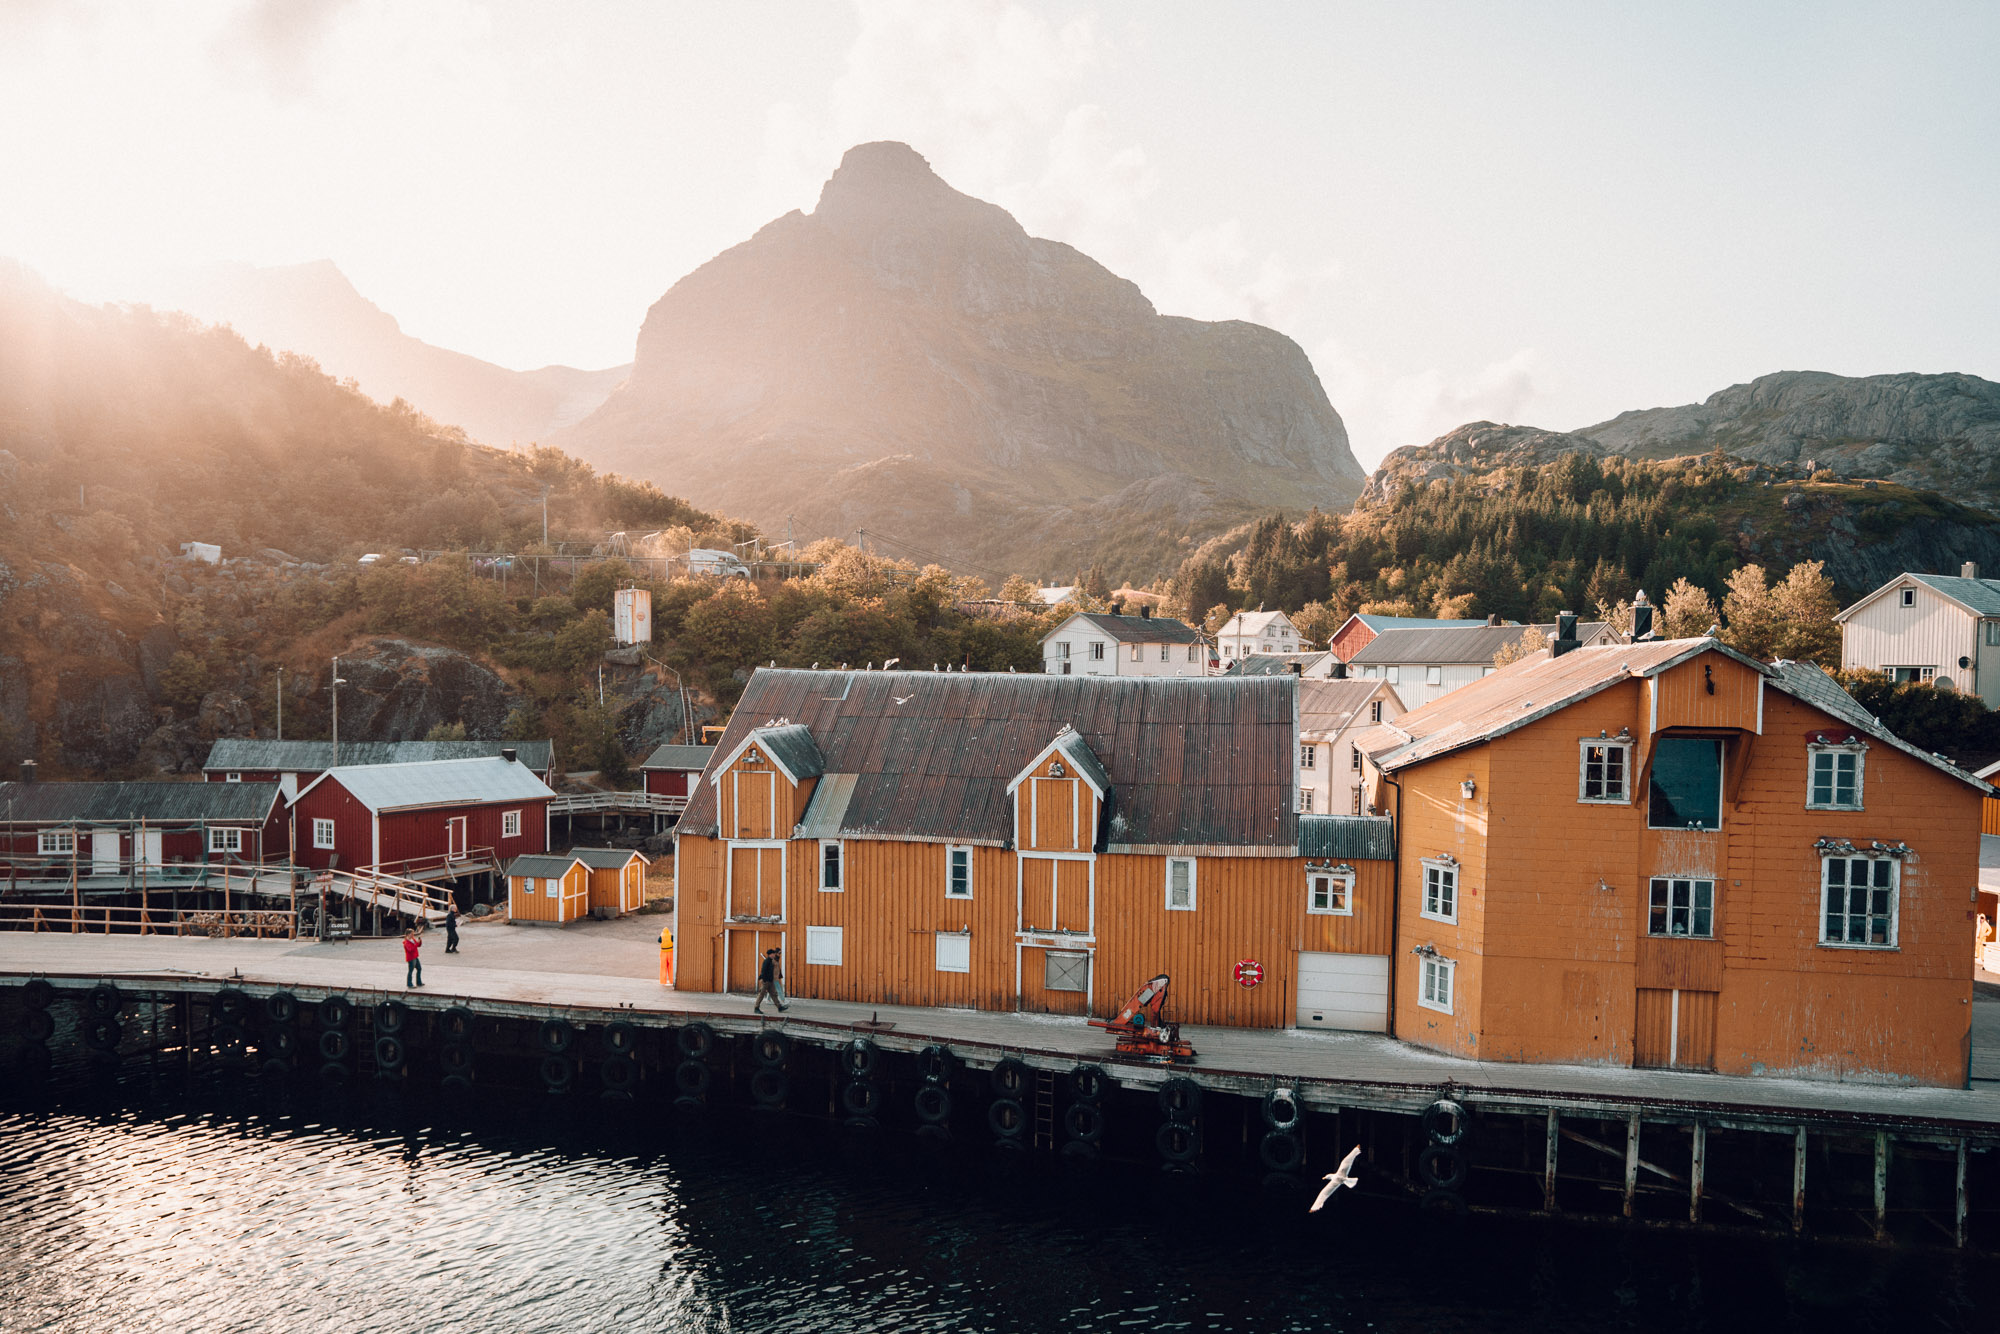 Nusfjord Arctic Resort in Nusfjord fishing town in Lofoten, Norway